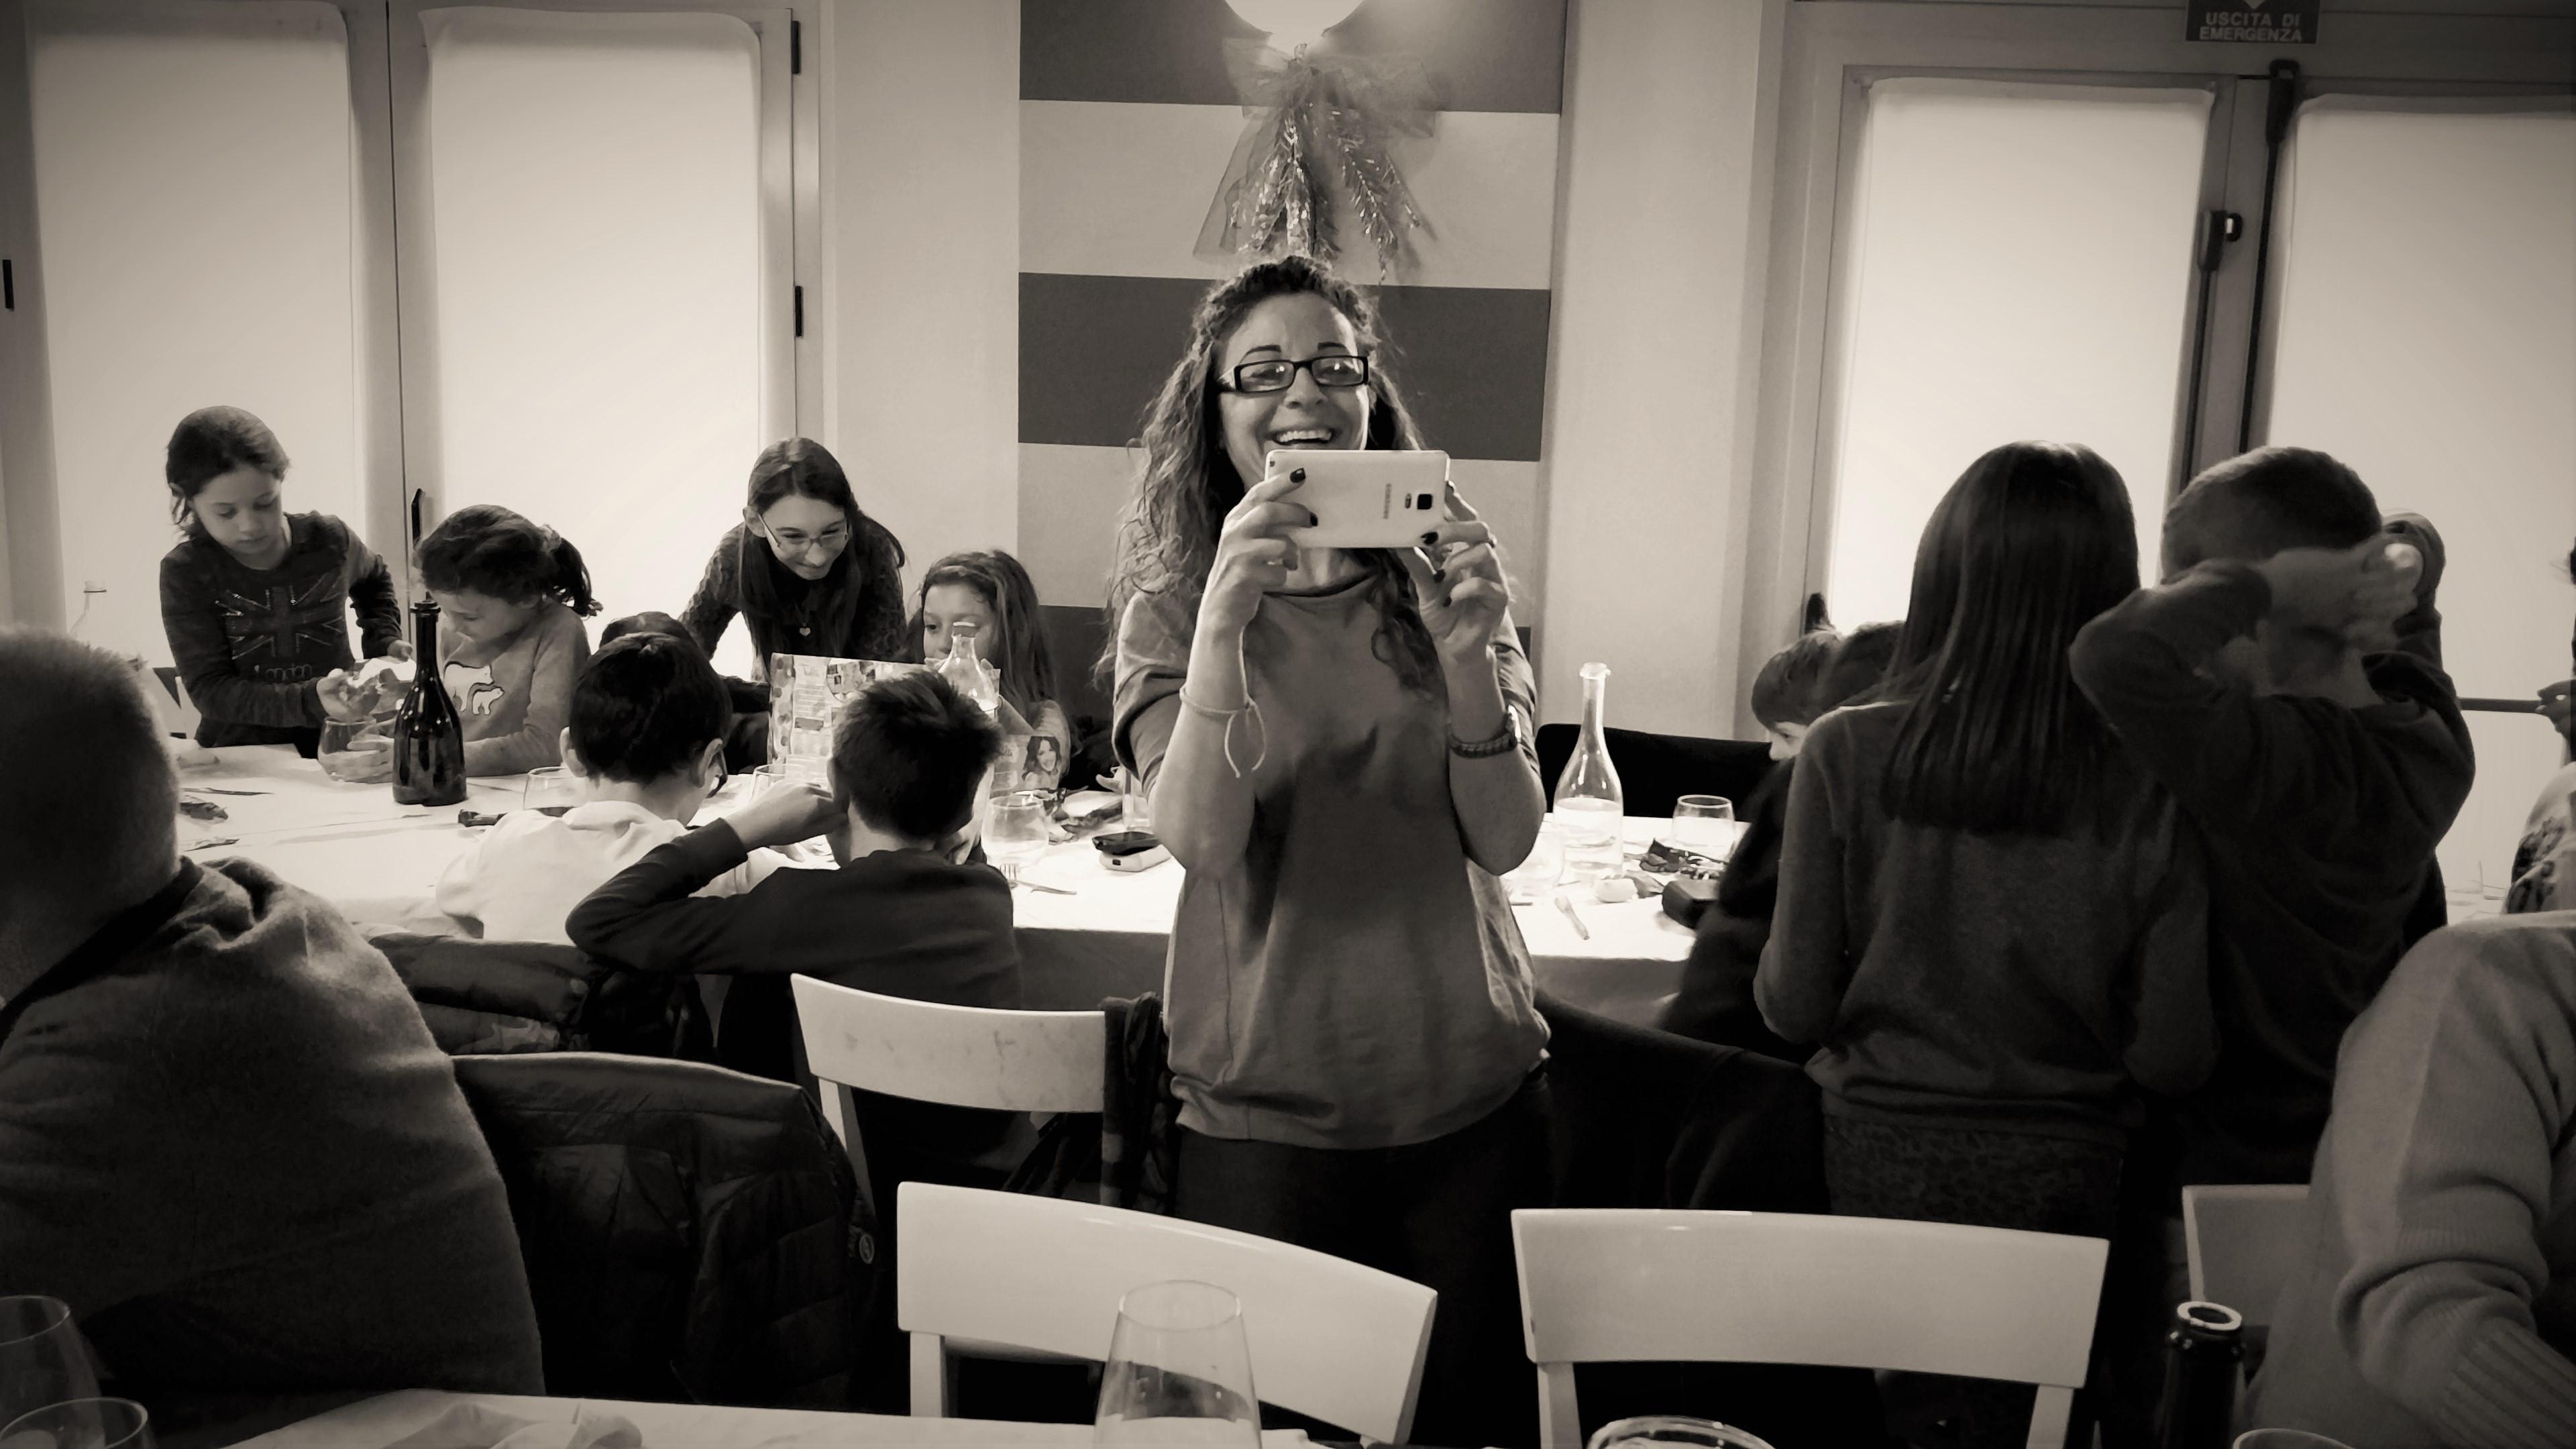 pranzo natale 2015 (19)